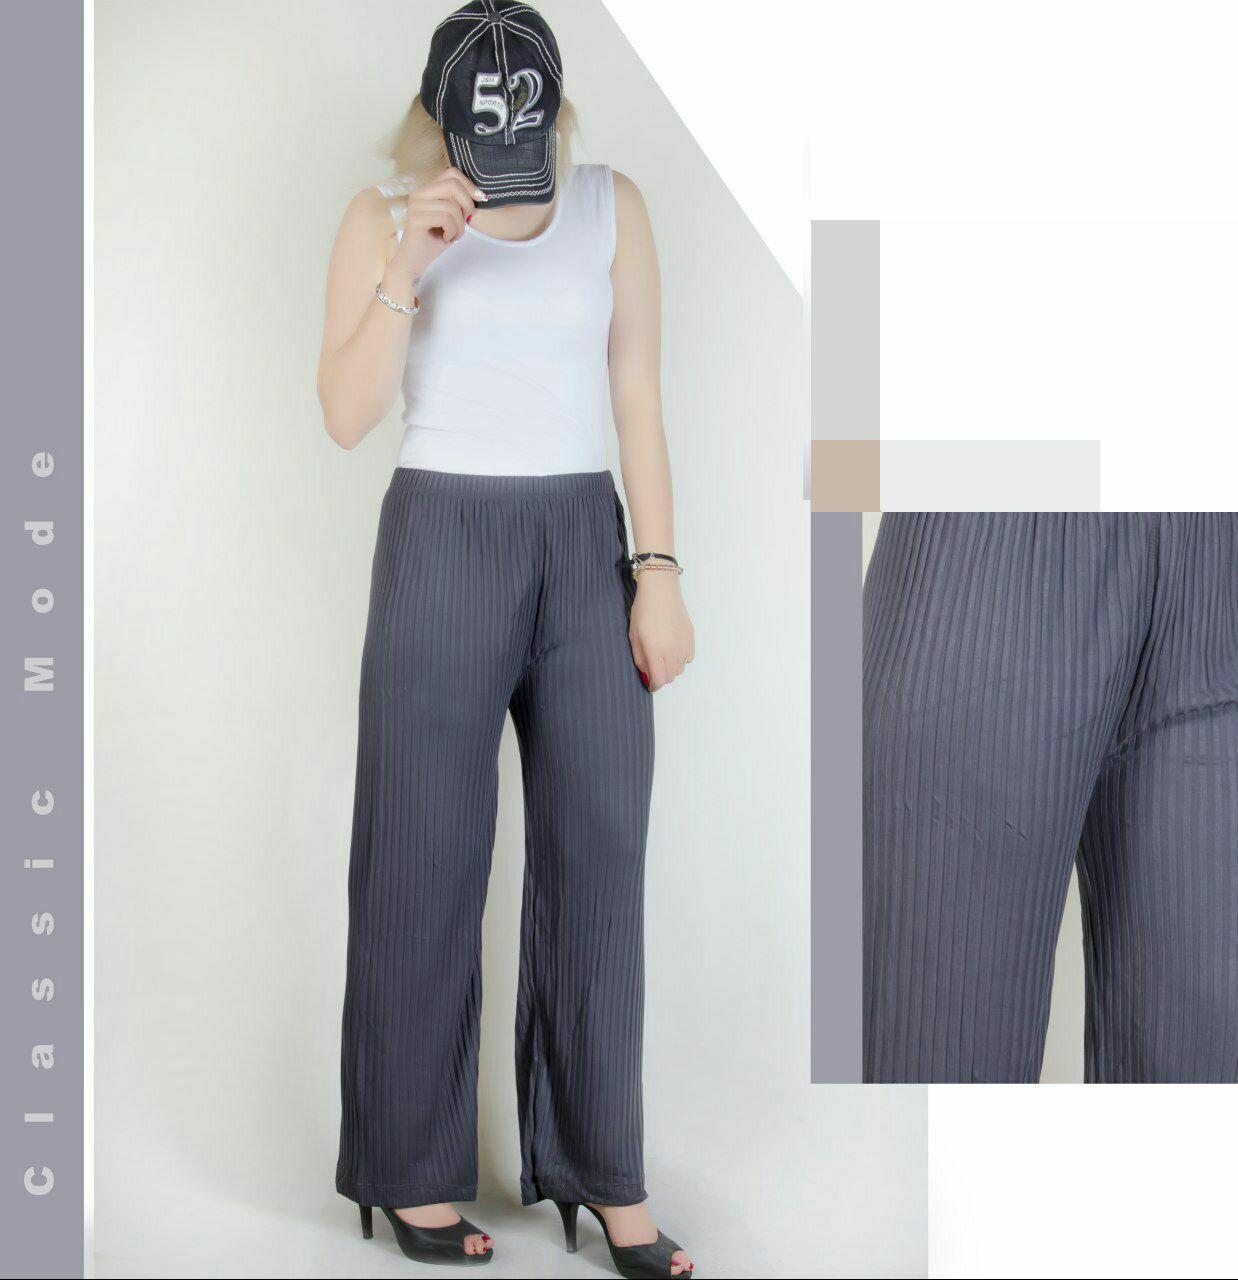 تولید و پخش پوشاک فیتنس